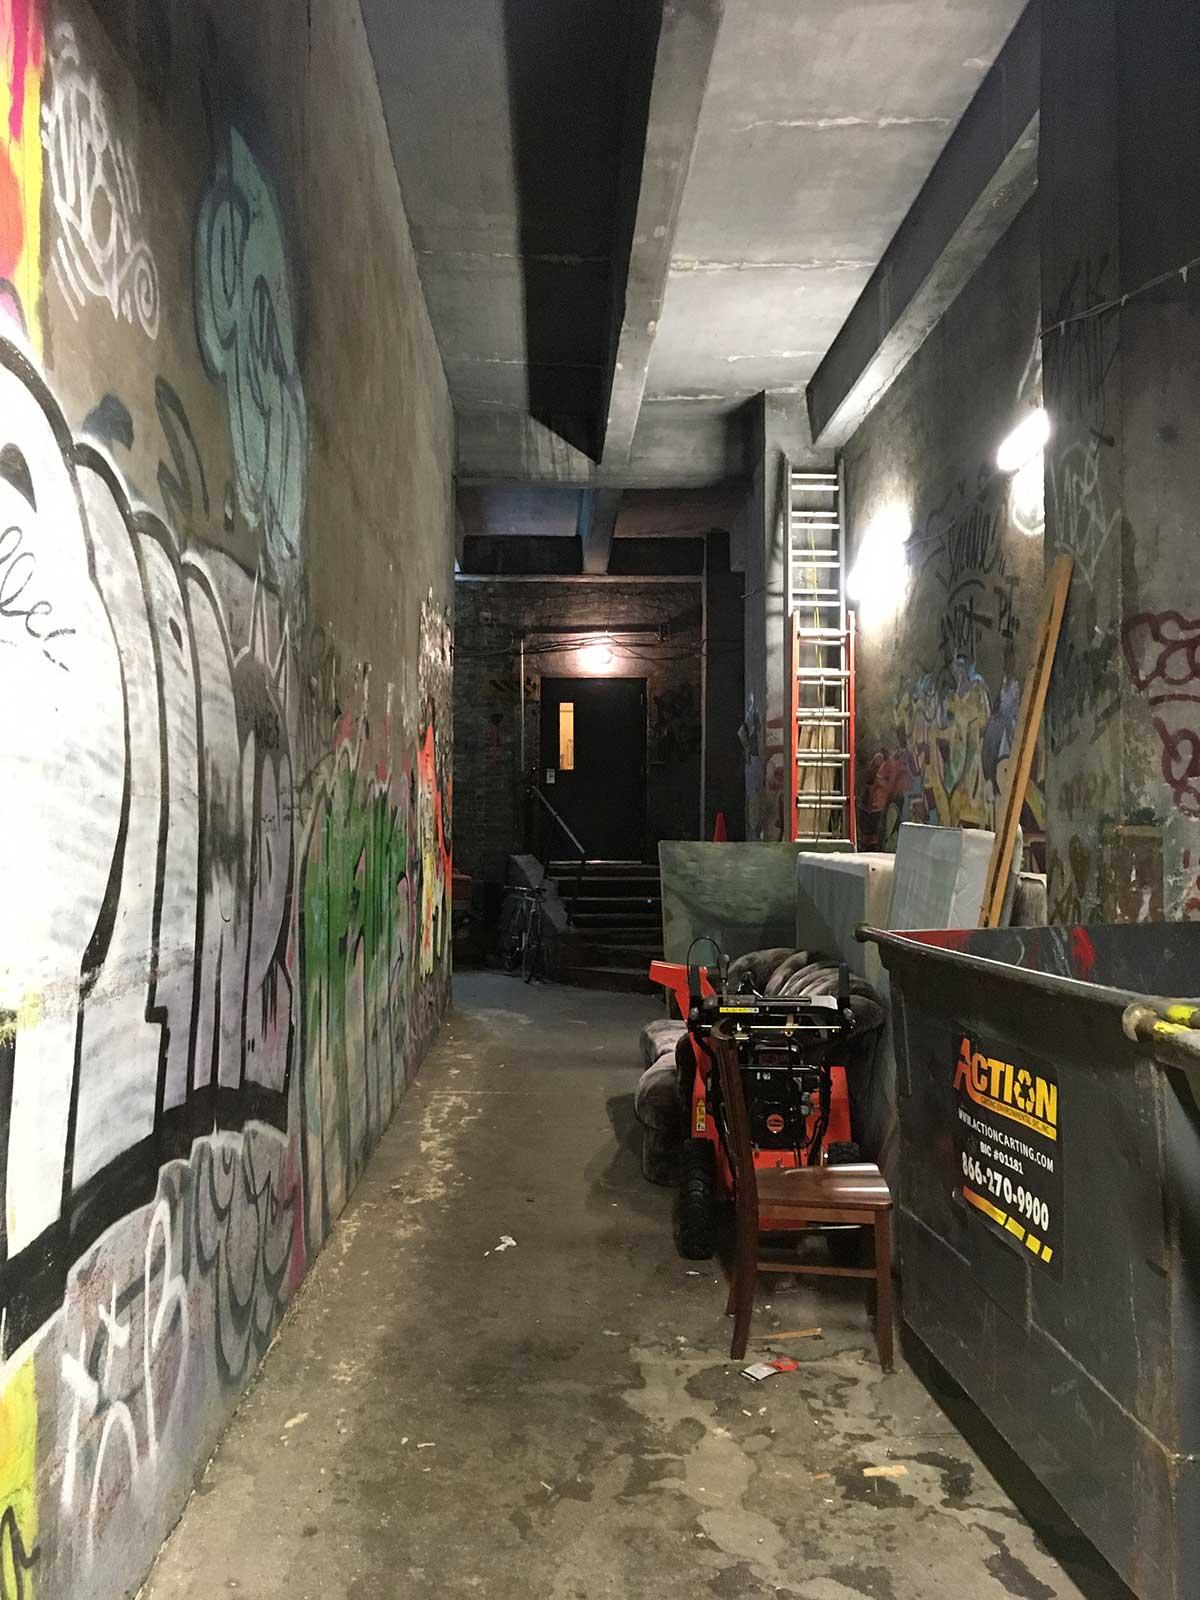 Williamsburg loft space, pre-gentrificaiton